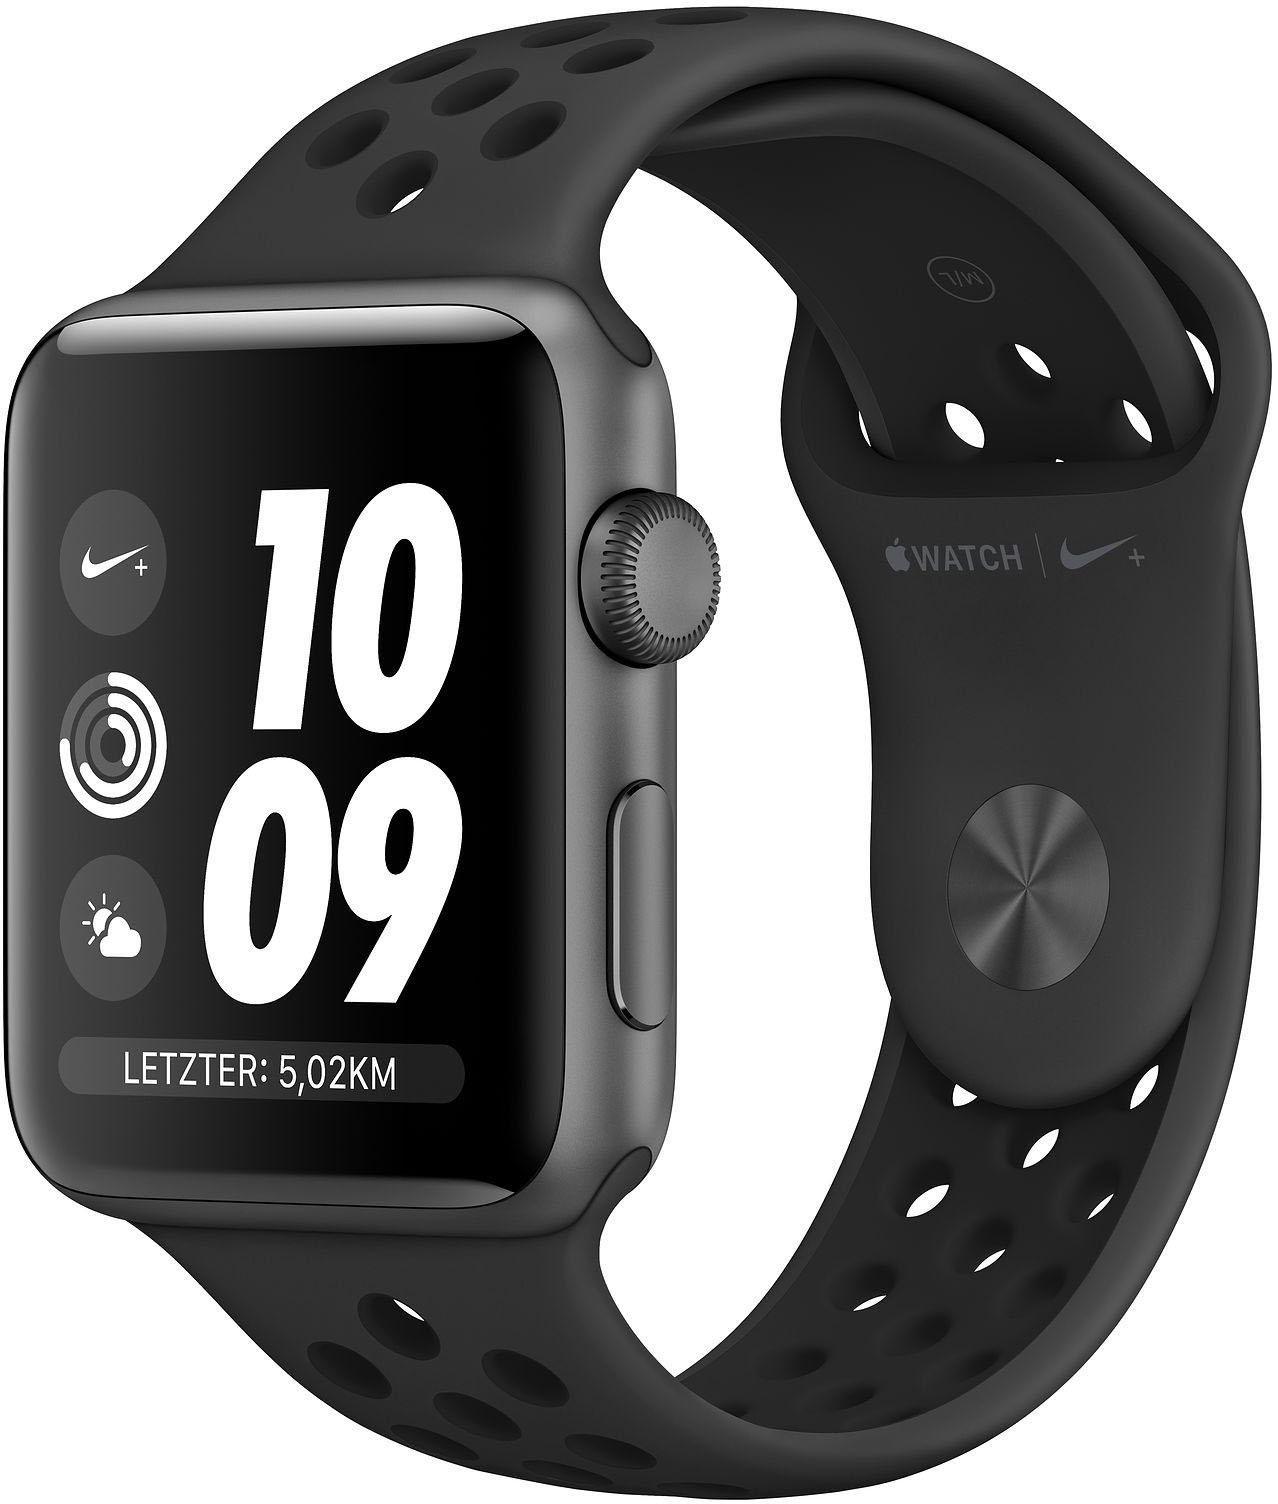 Apple Nike+ Series 3 GPS, aluminiumkast met Nike-sportarmband 38 mm Watch (watchOS 5) online kopen op otto.nl